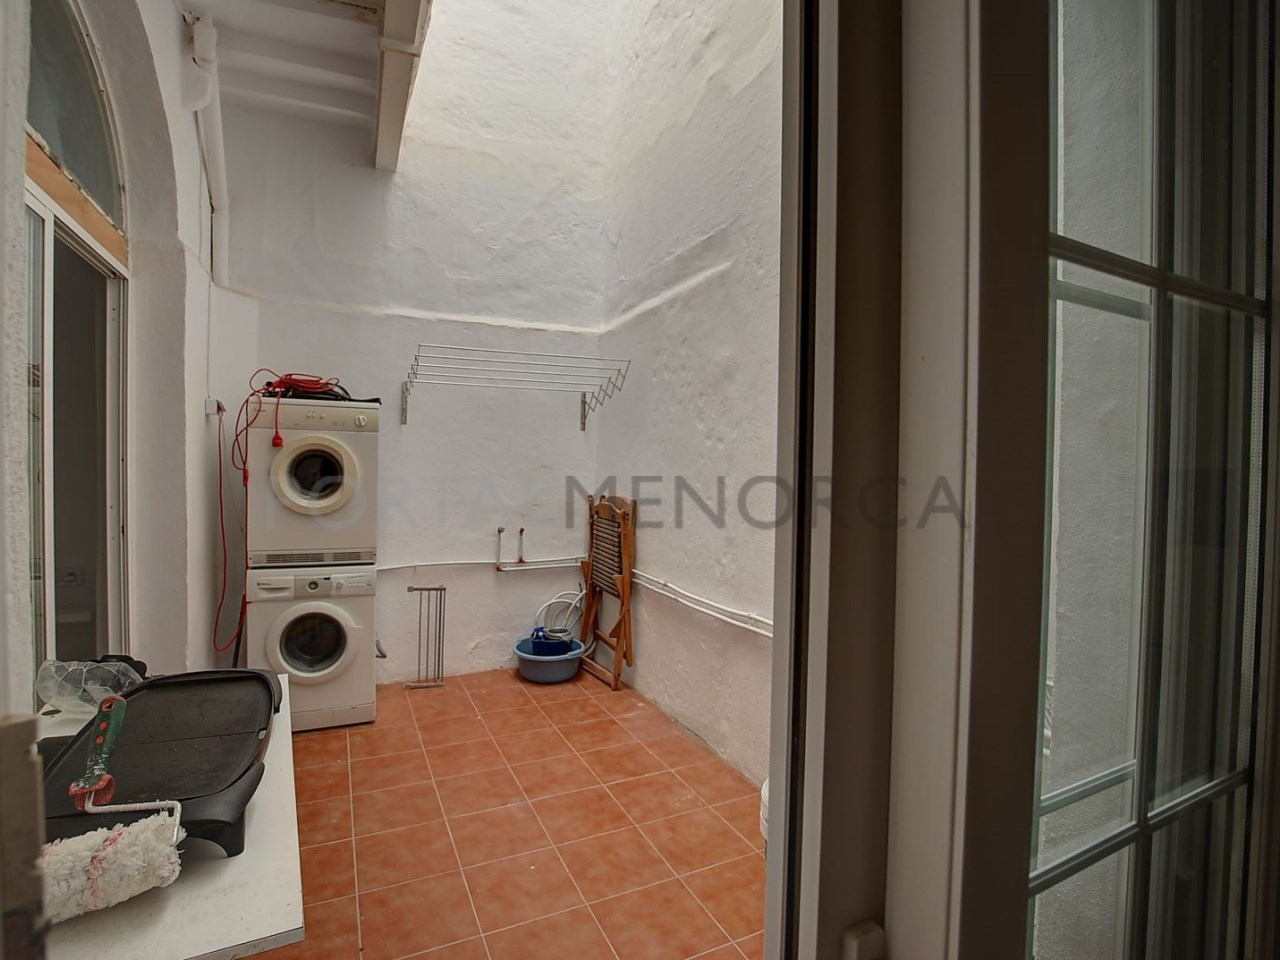 patio_planta_baja_mahon_menorca-H2512